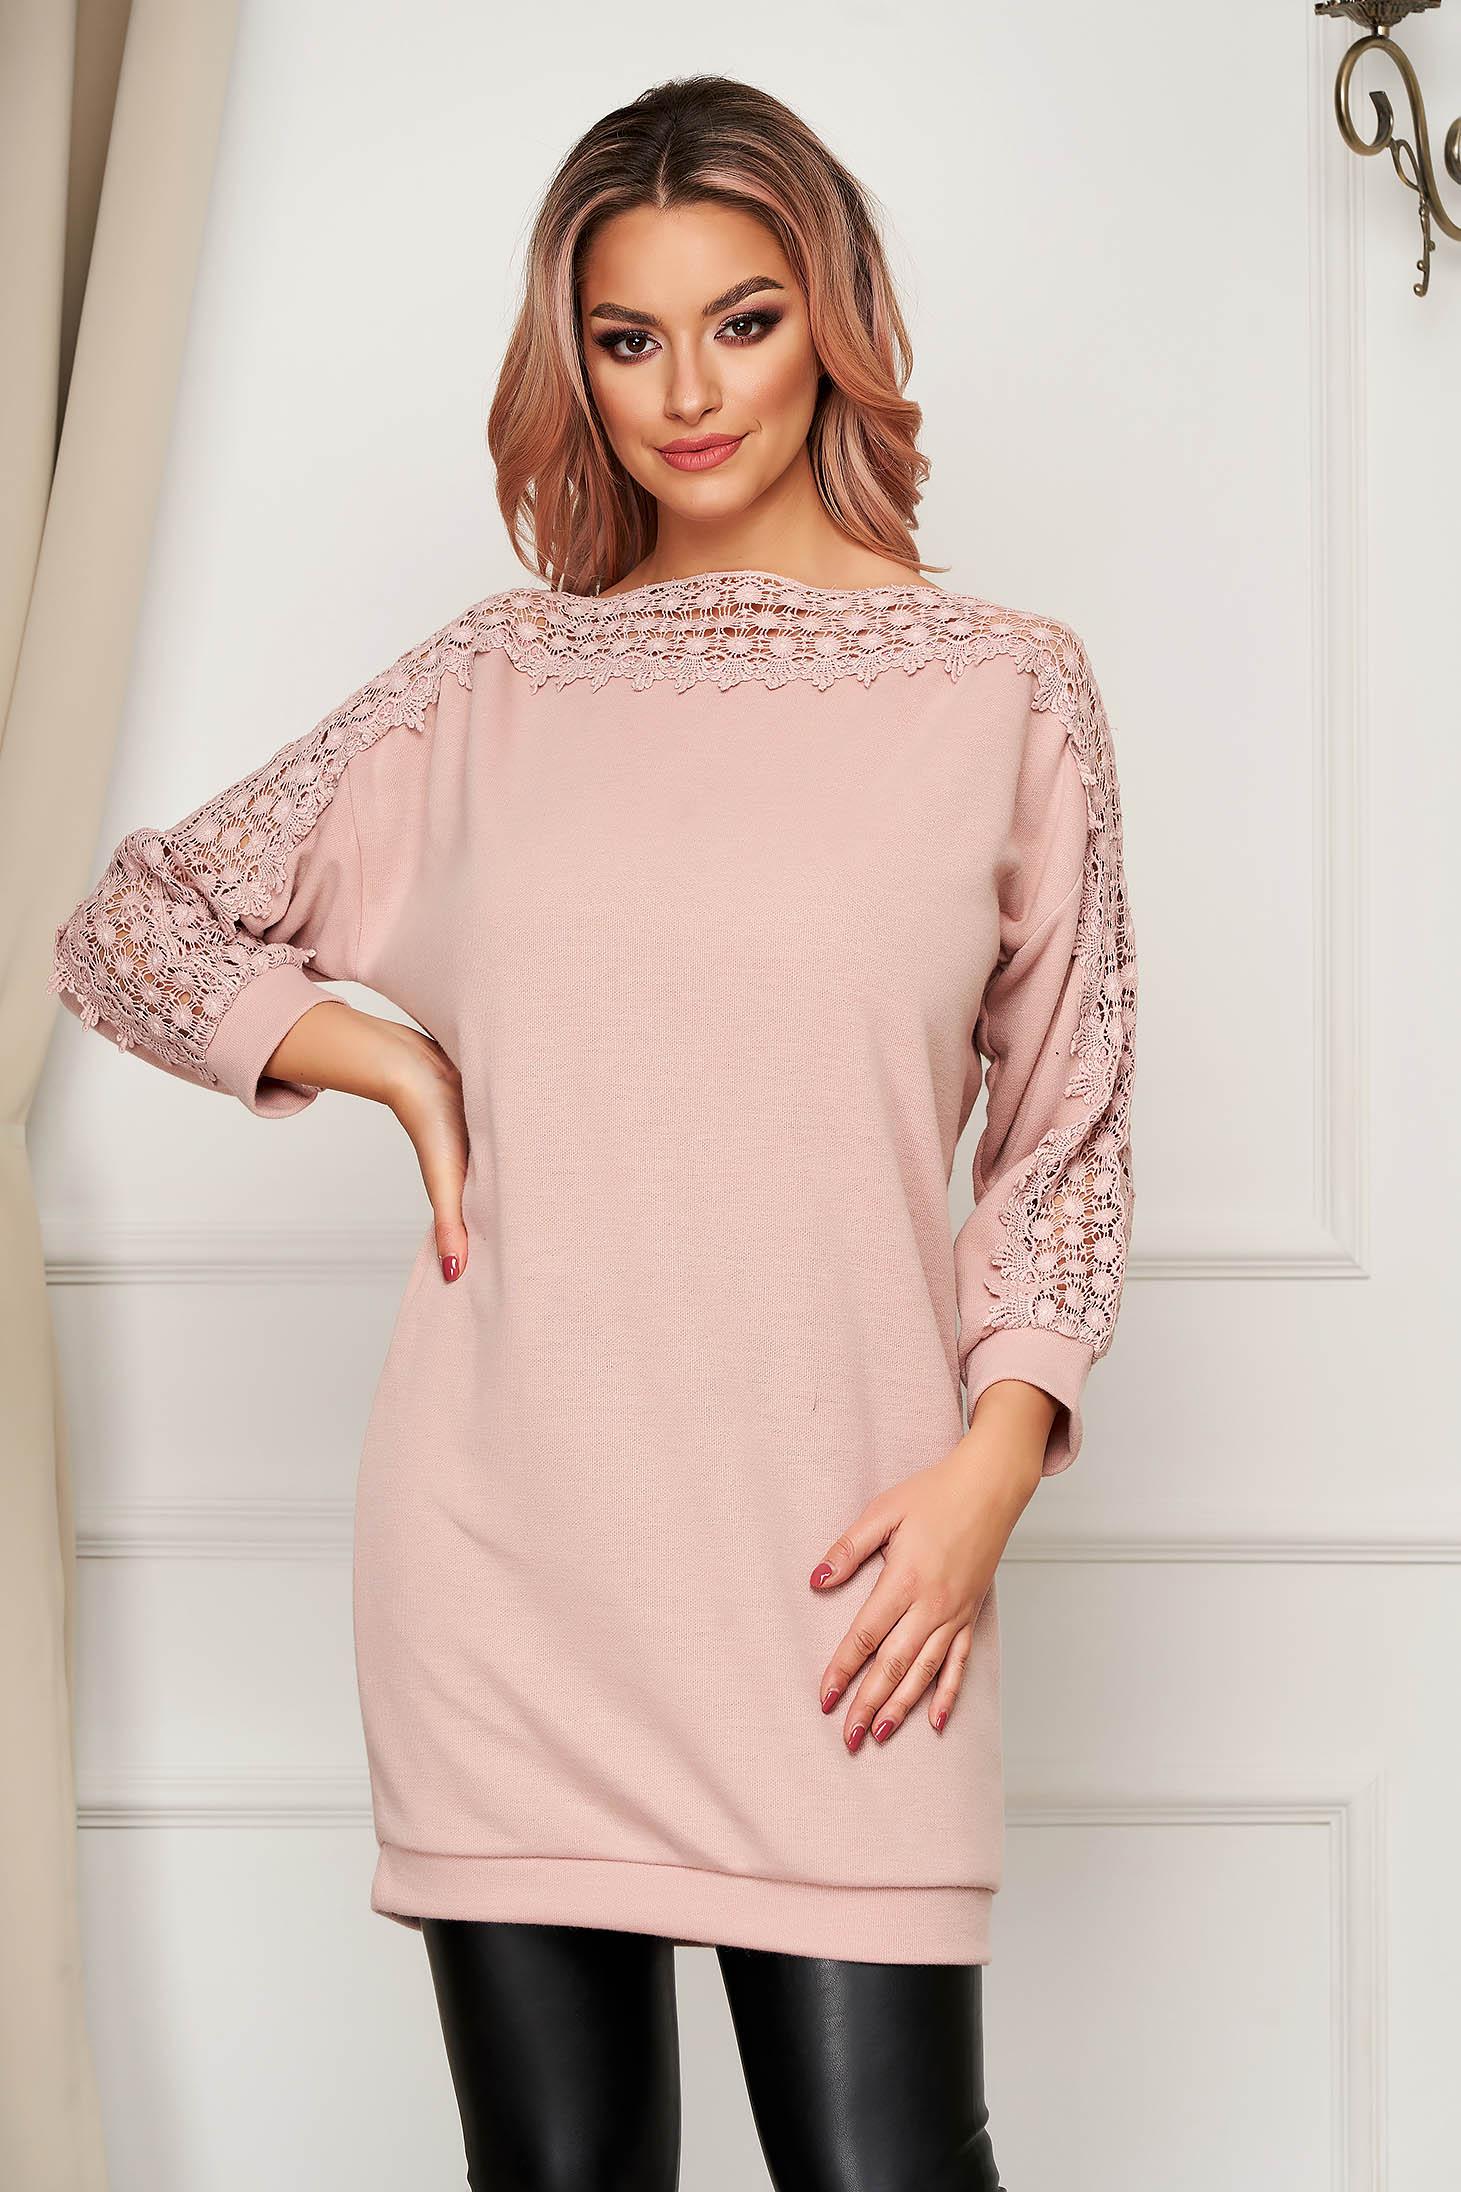 Pulover SunShine roz deschis casual lunga din material tricotat cu croi larg si insertii de broderie